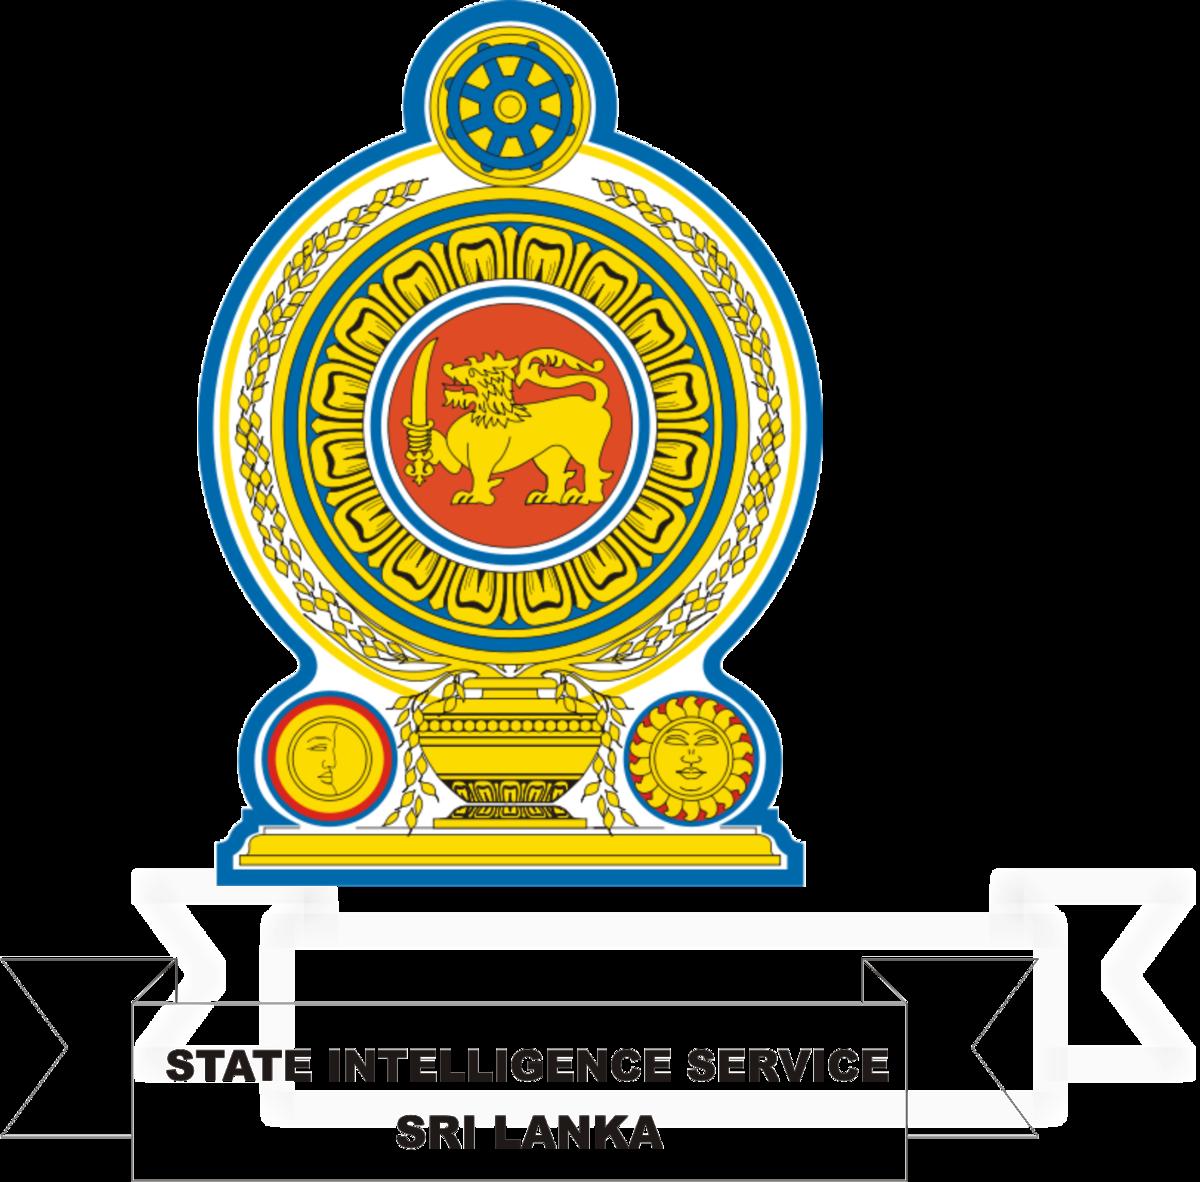 State intelligence service sri lanka wikipedia - Sri lankan passport office in colombo ...